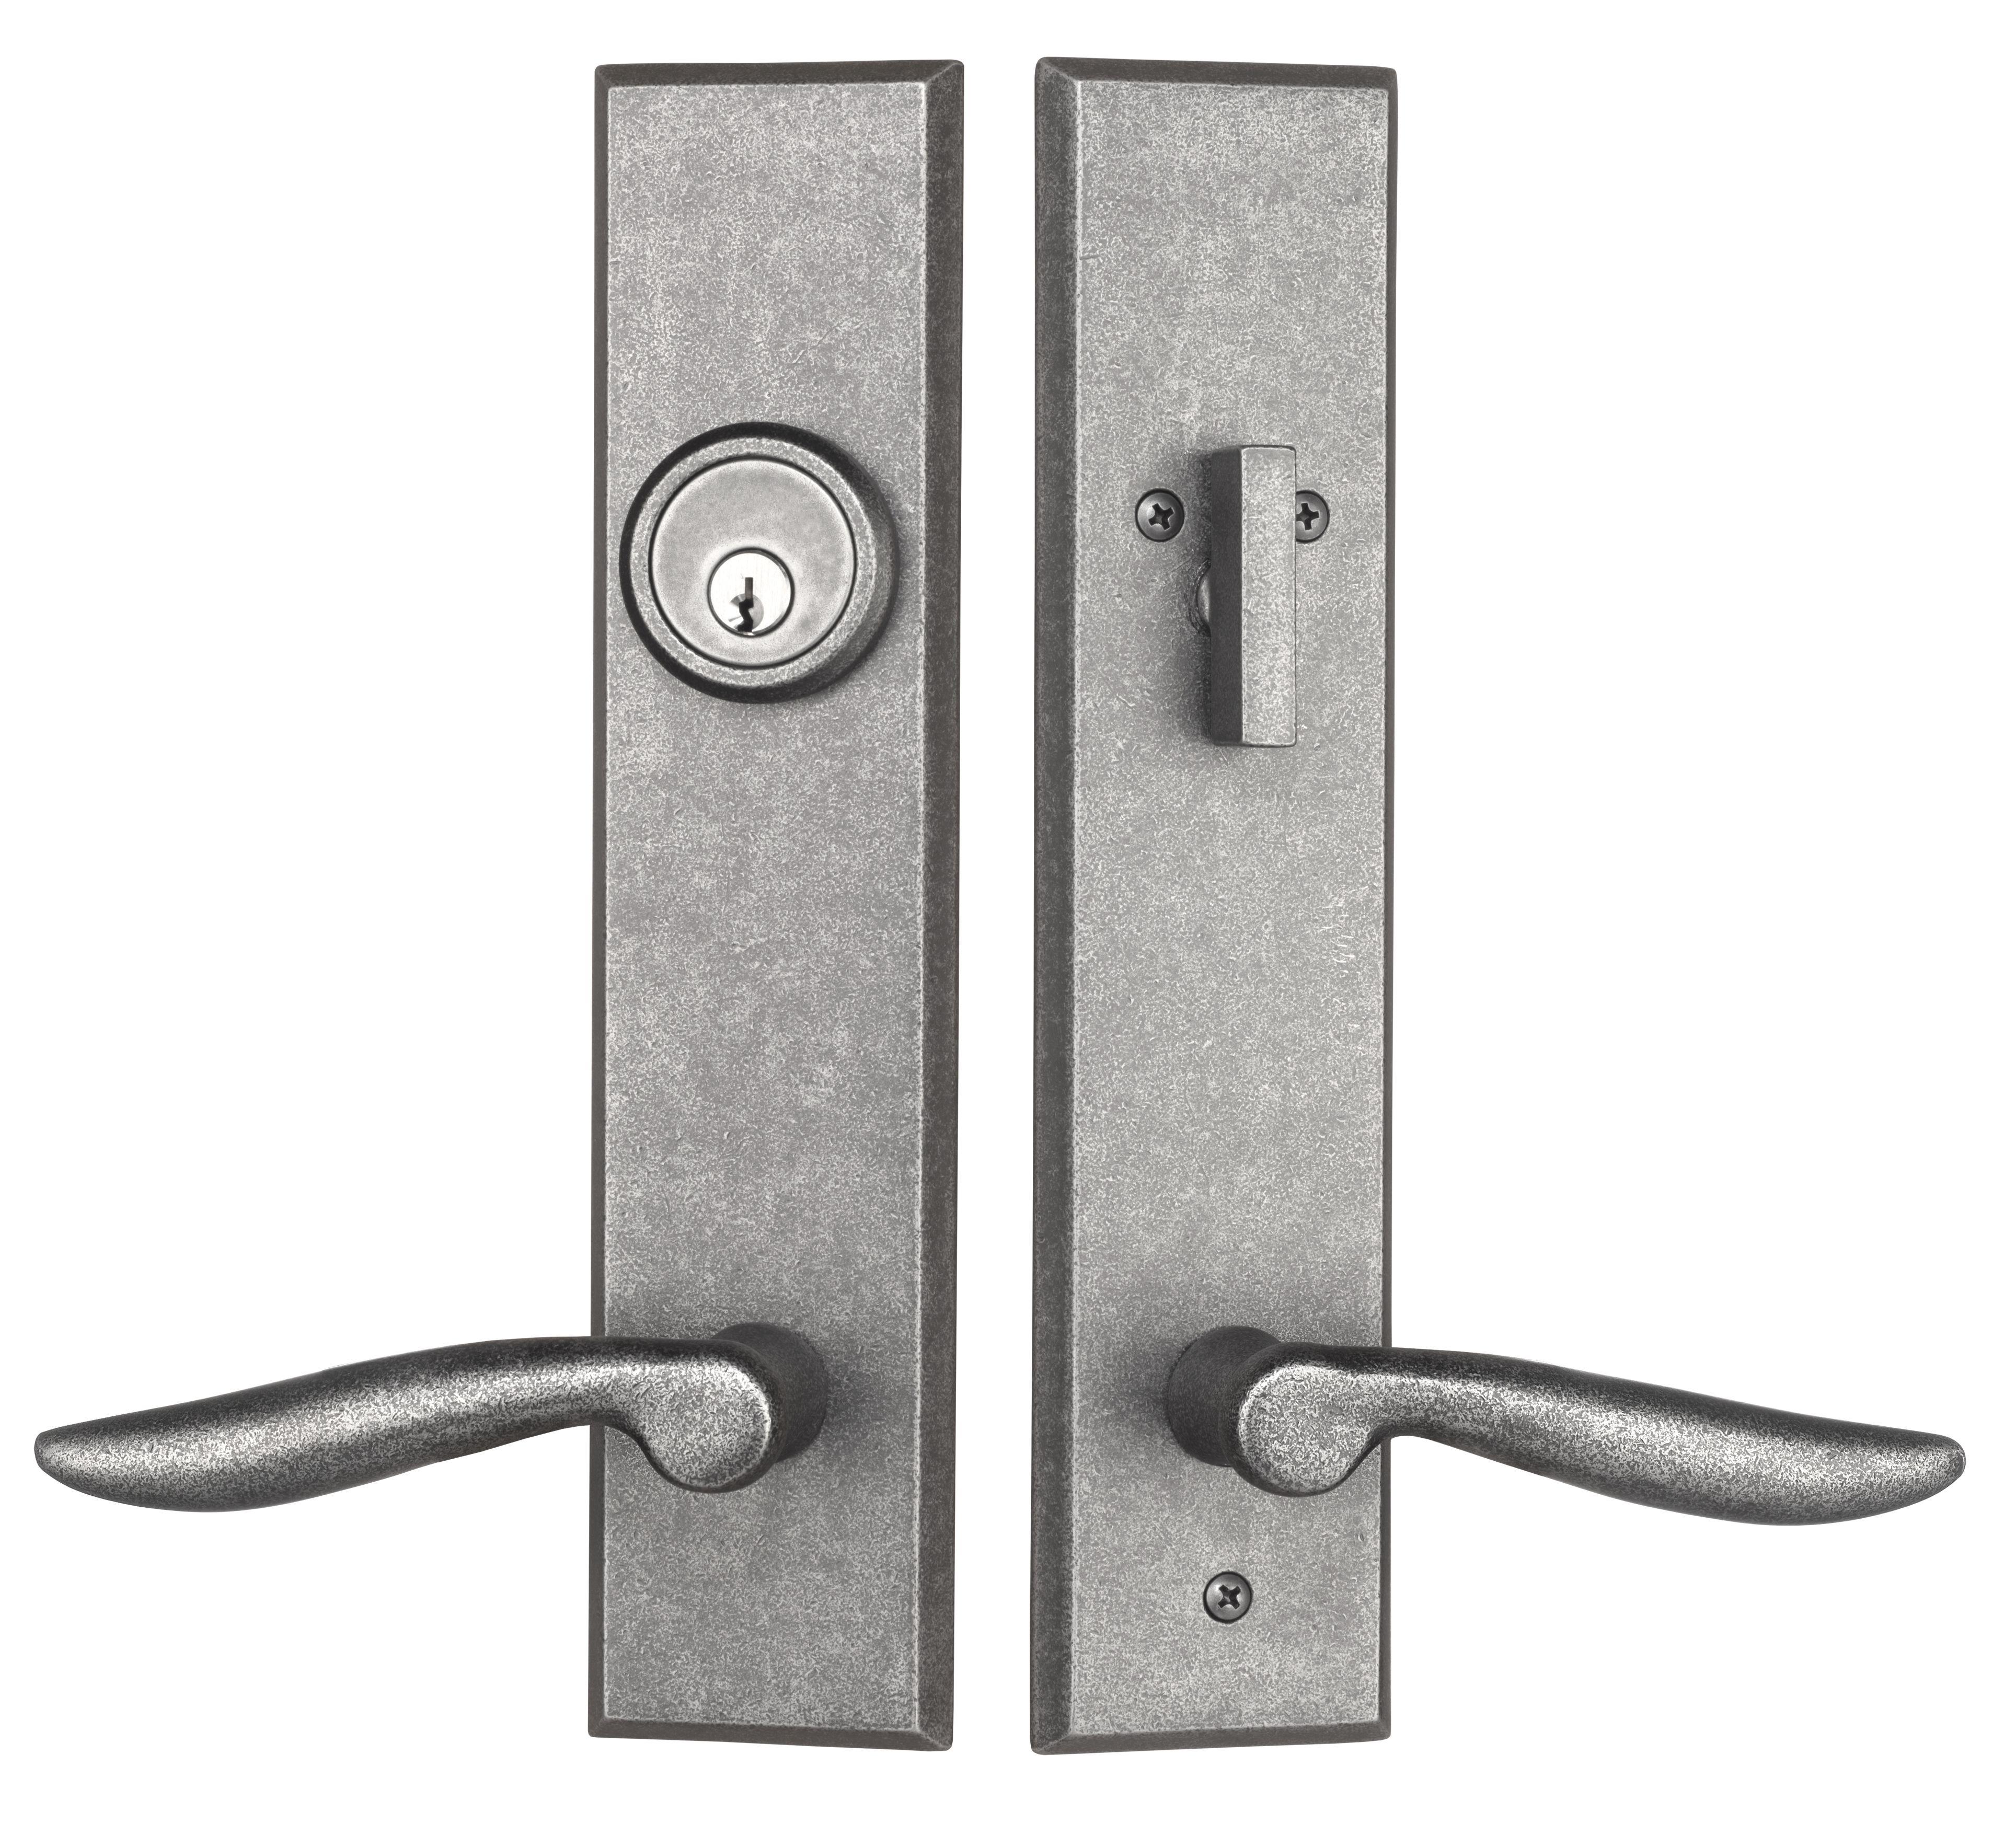 Rockwell Verano Premium Entry Door Handle Set With Dahli Lever In Distressed Nickel Finish Rockwell Security Entry Door Handles Door Handles Door Handle Sets